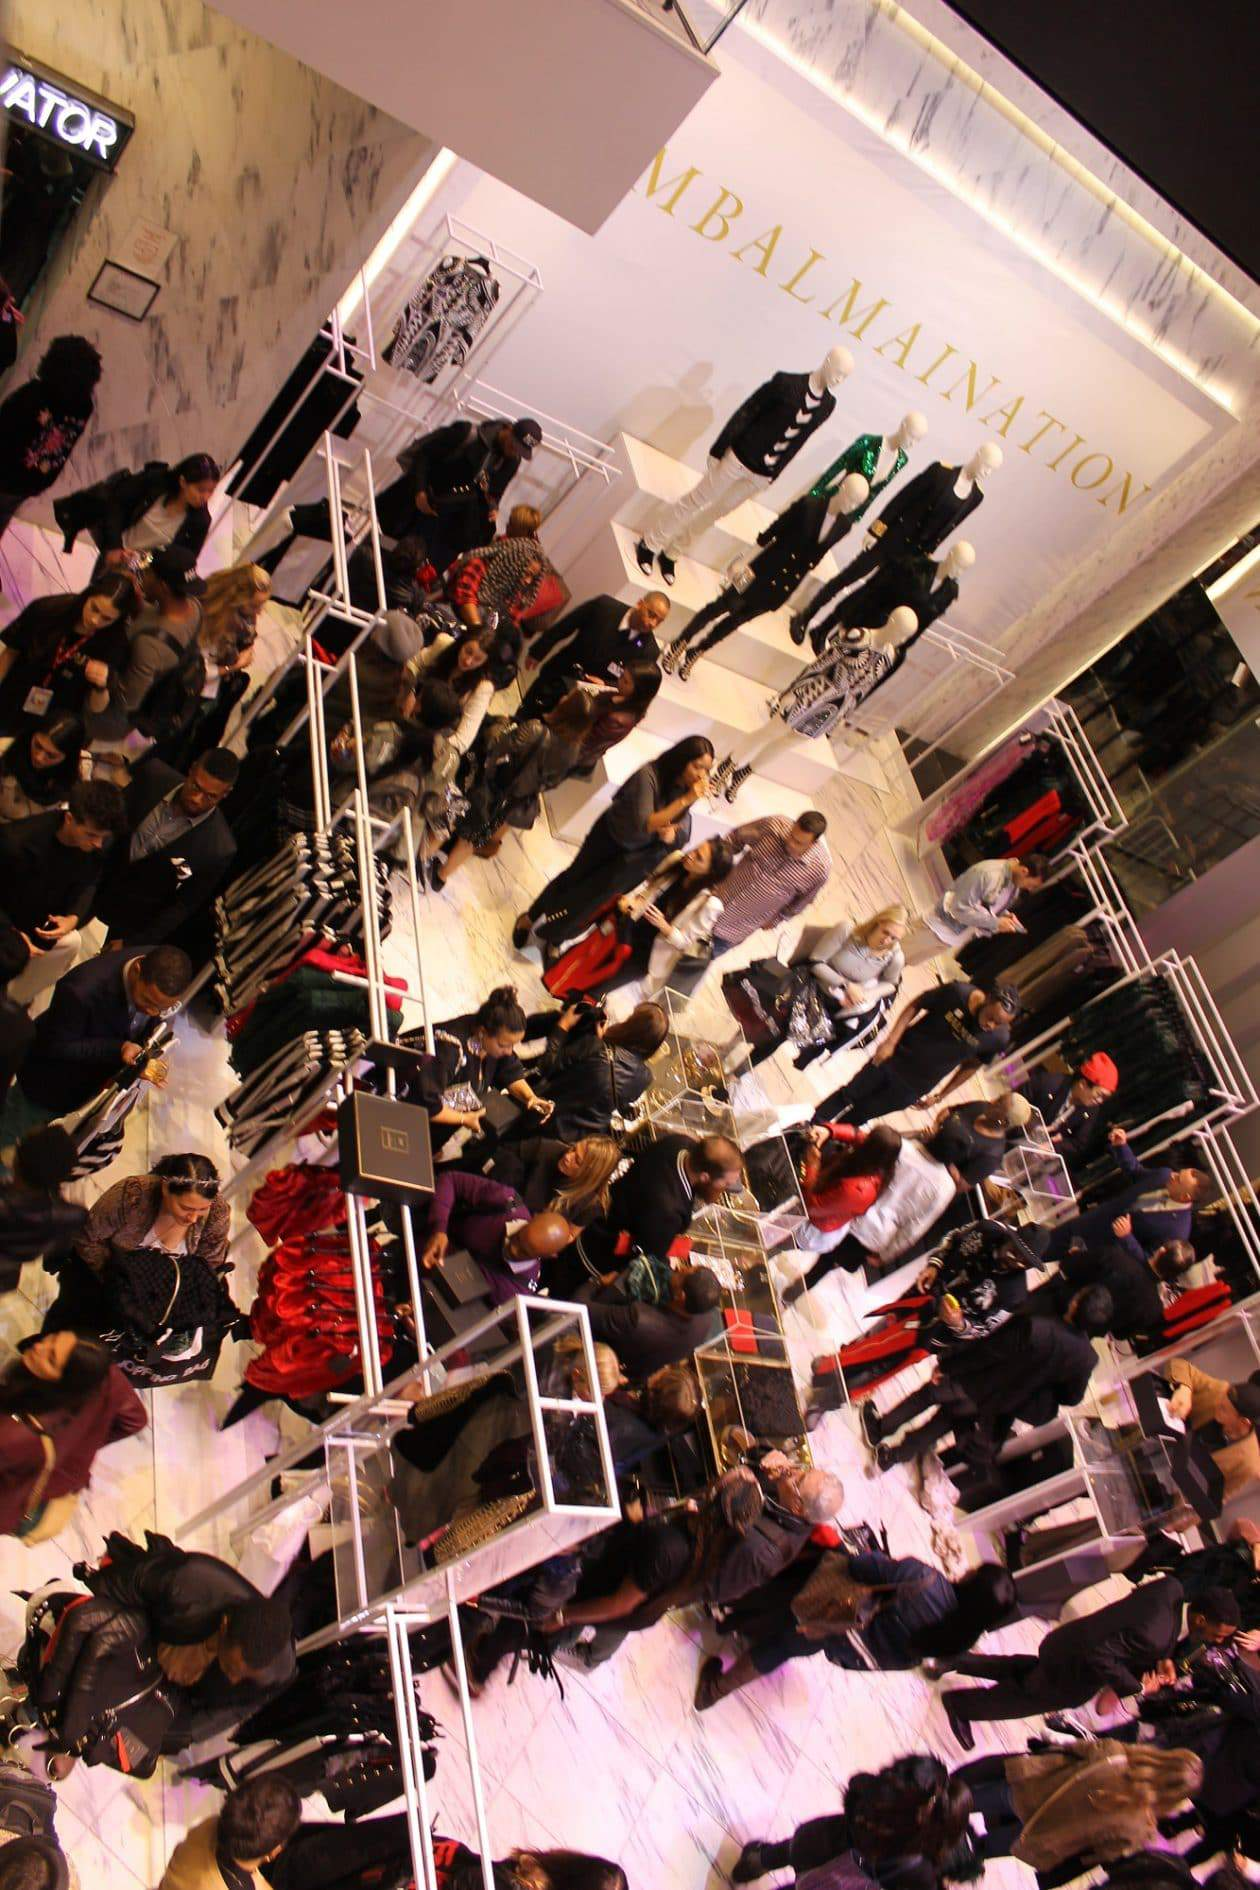 Liz Black attends the H&M x Balmain Collection Shopping Launch